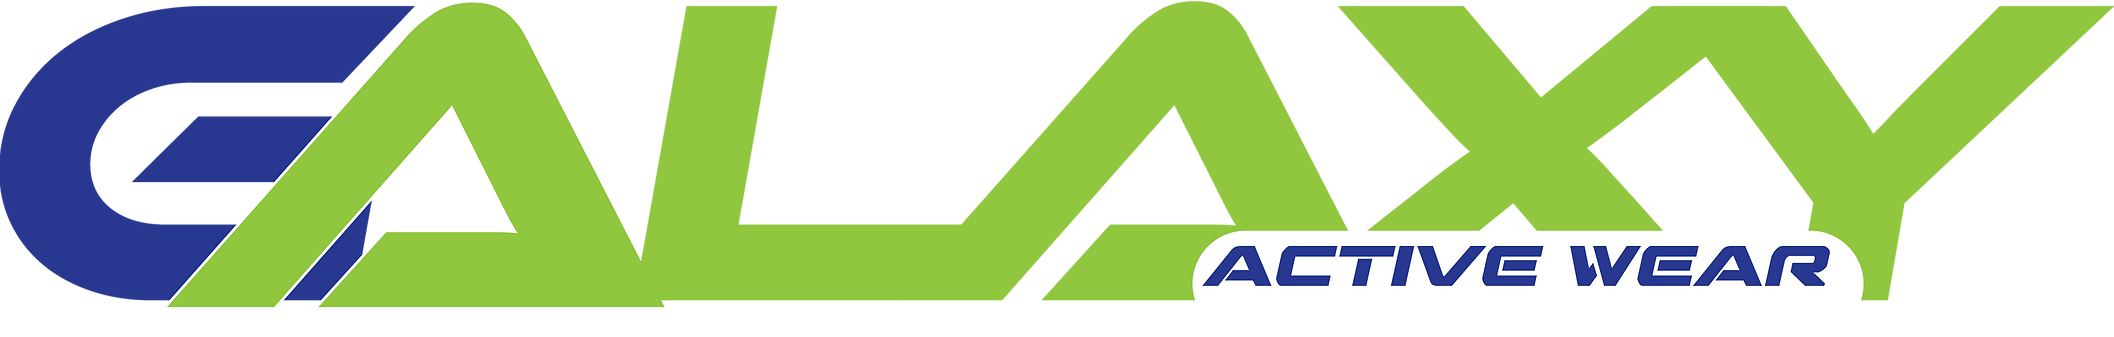 galaxy logo PNG bez tla.png